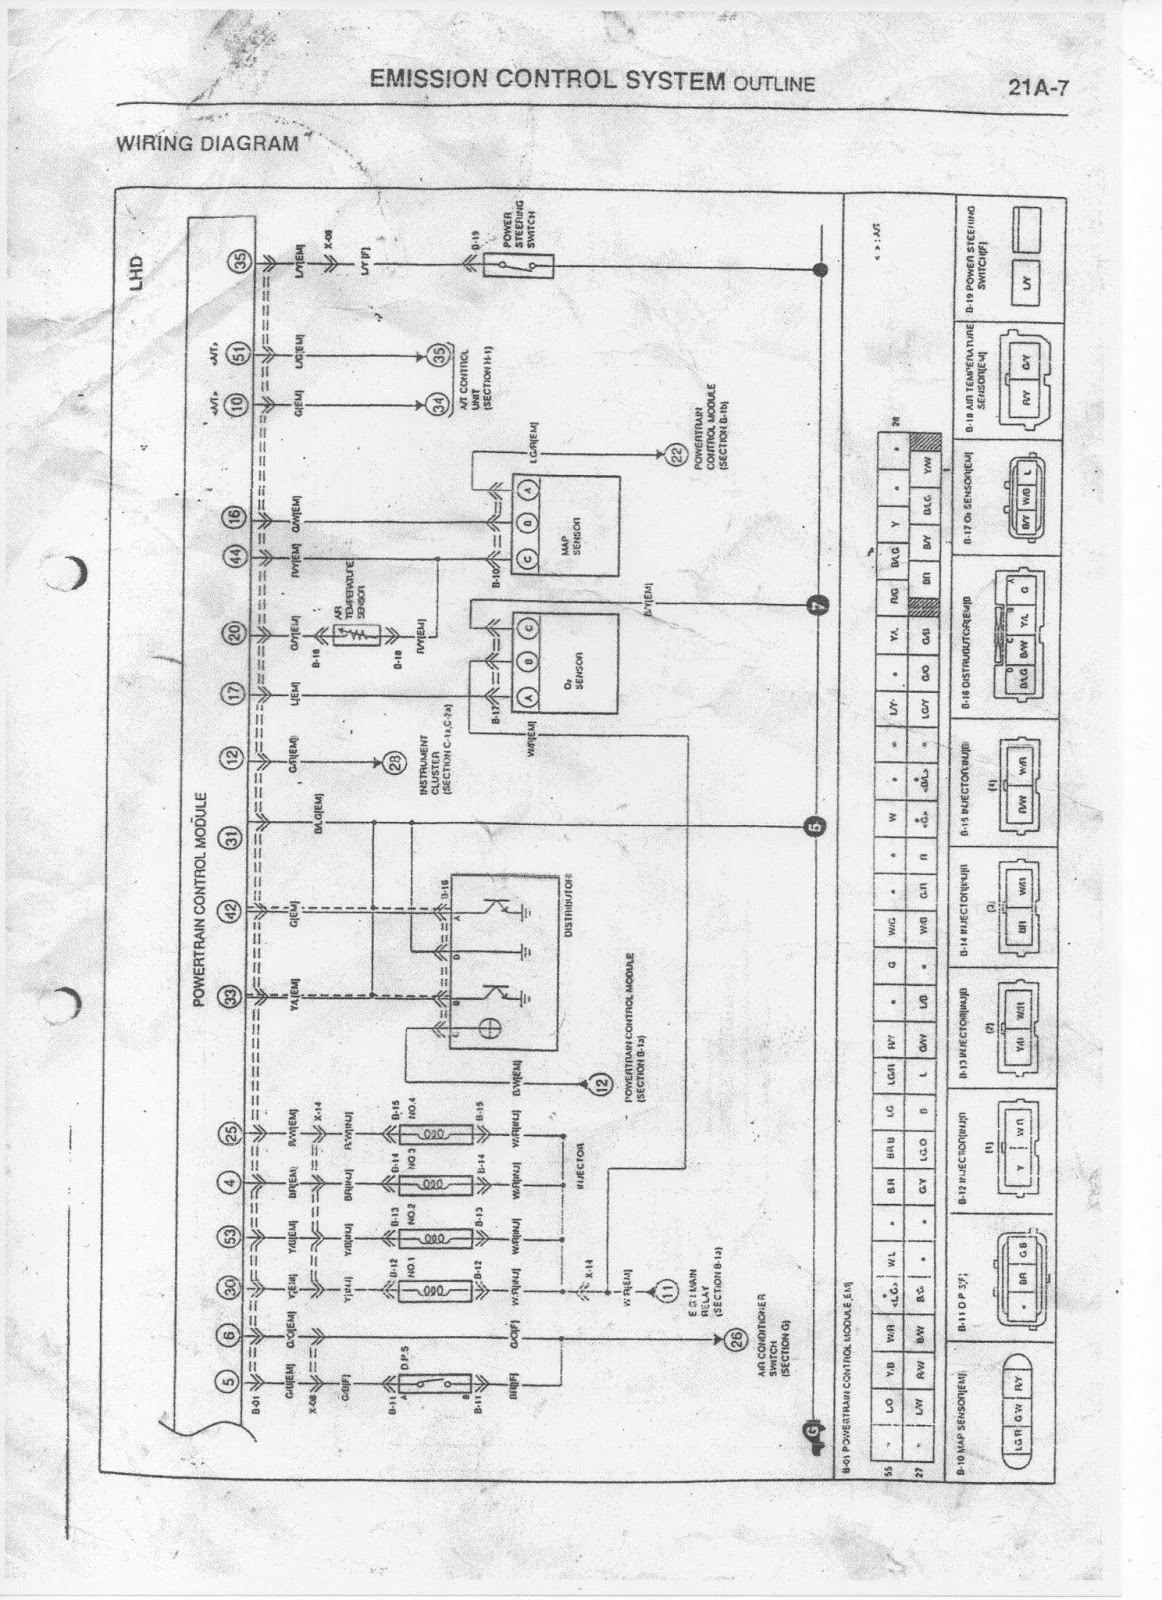 small resolution of wiring diagram kia sephia master mobil efiwiring diagram kia sephia